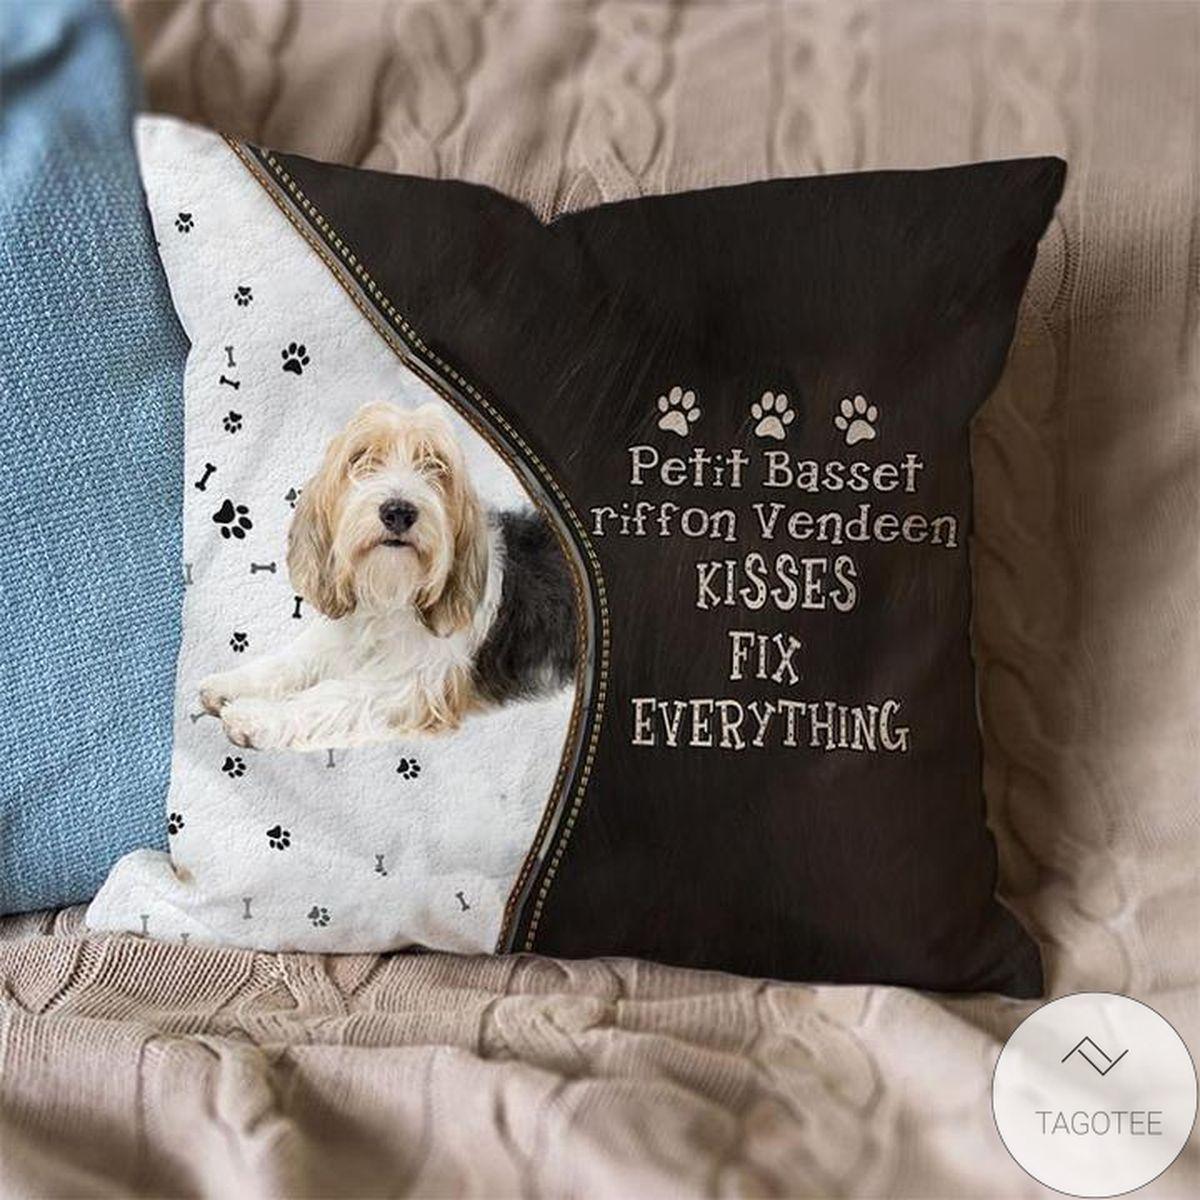 Excellent Petit Basset Griffon Vendeen Kisses Fix Everything Pillowcase